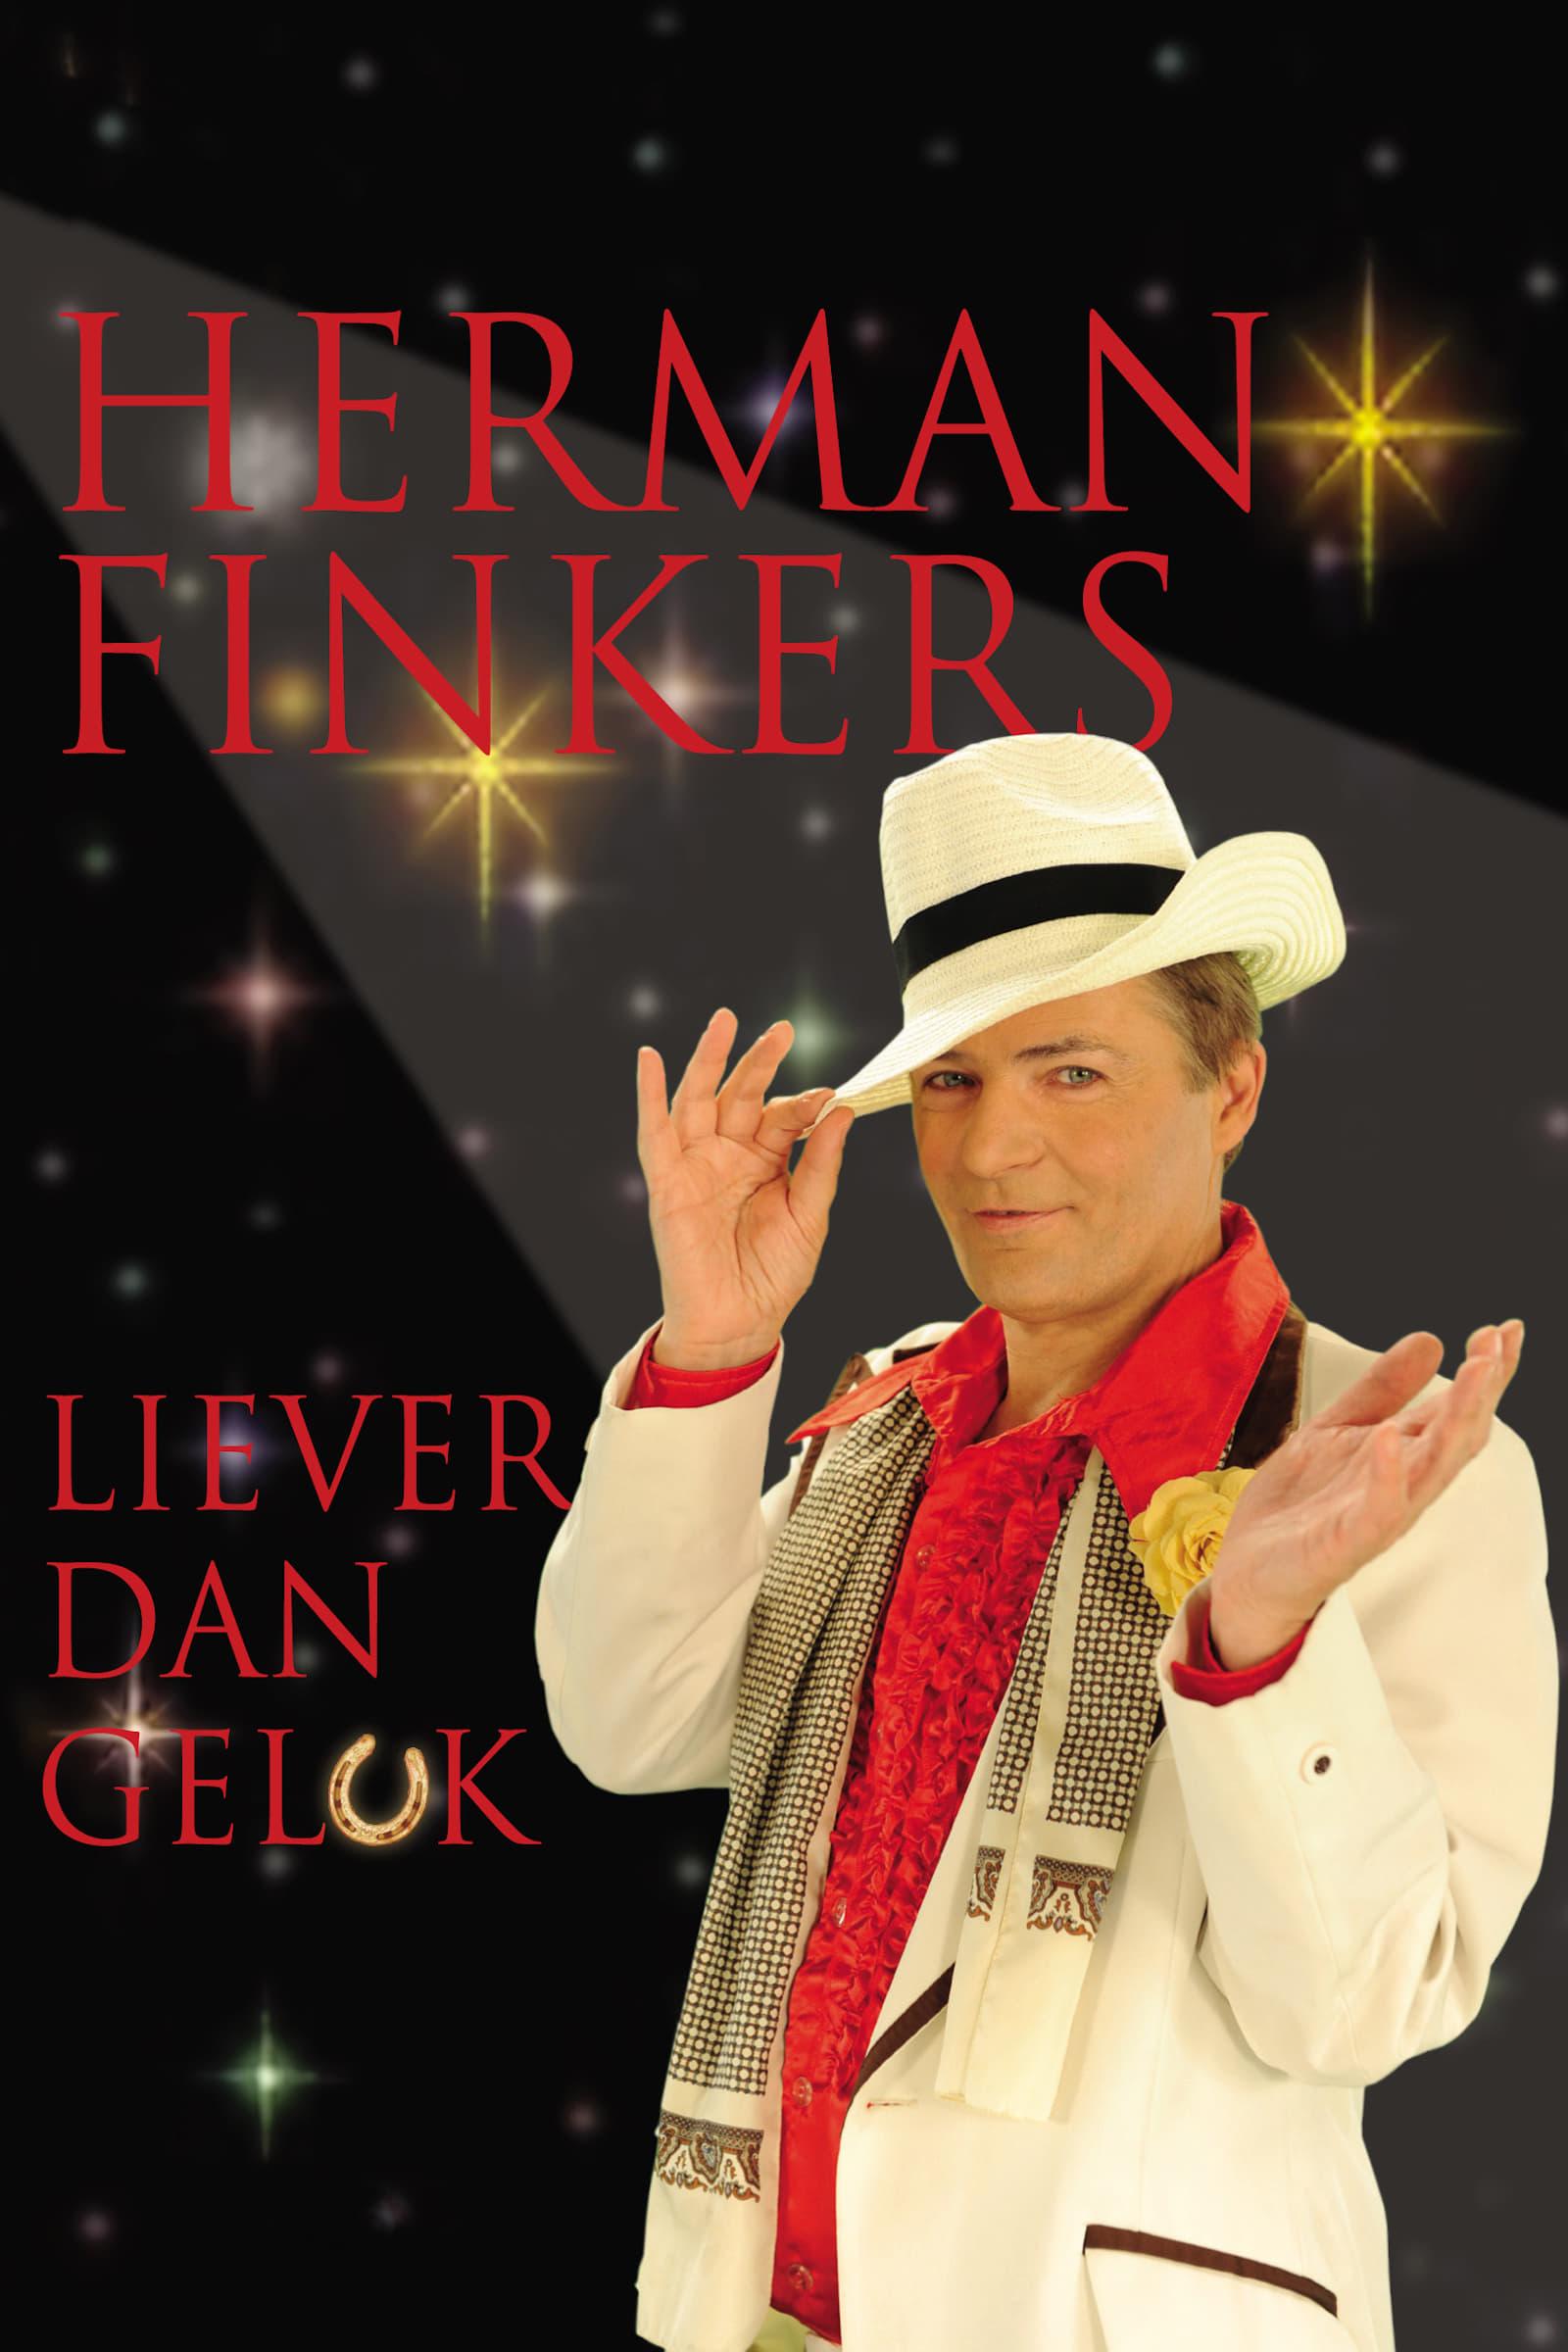 Herman Finkers: Liever Dan Geluk